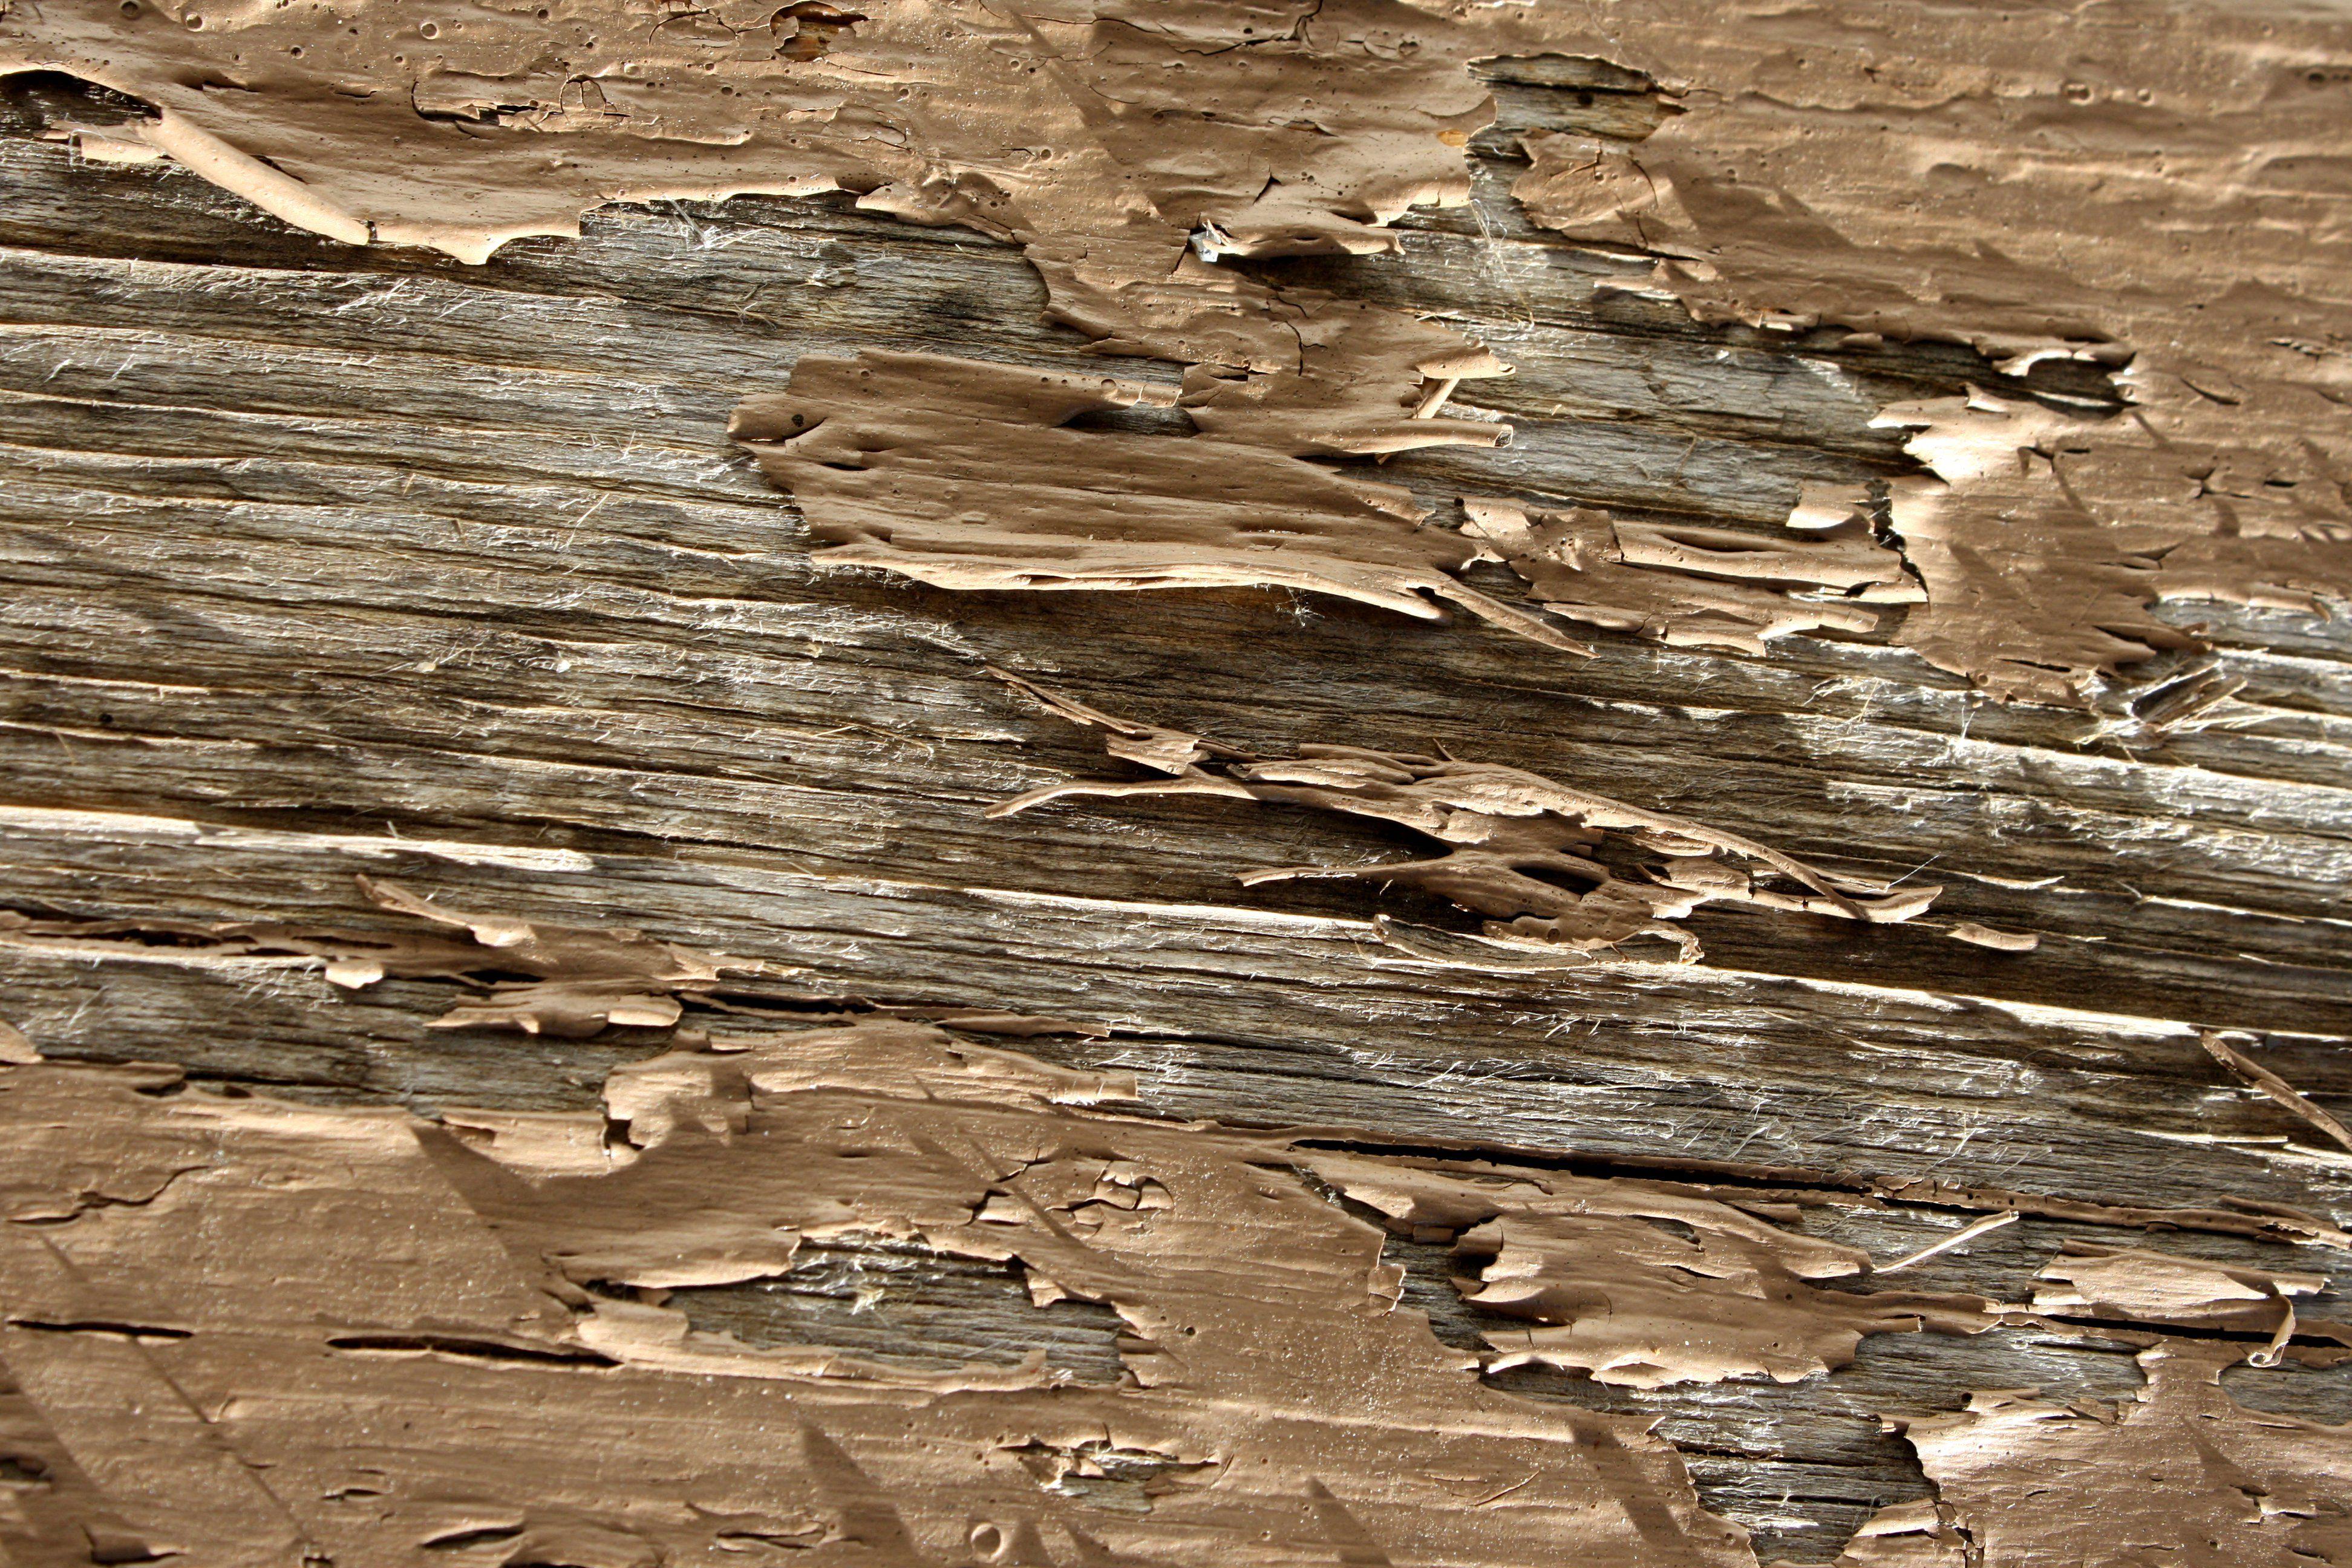 Peeling Brown Paint Texture Picture | Free Photograph | Photos ...